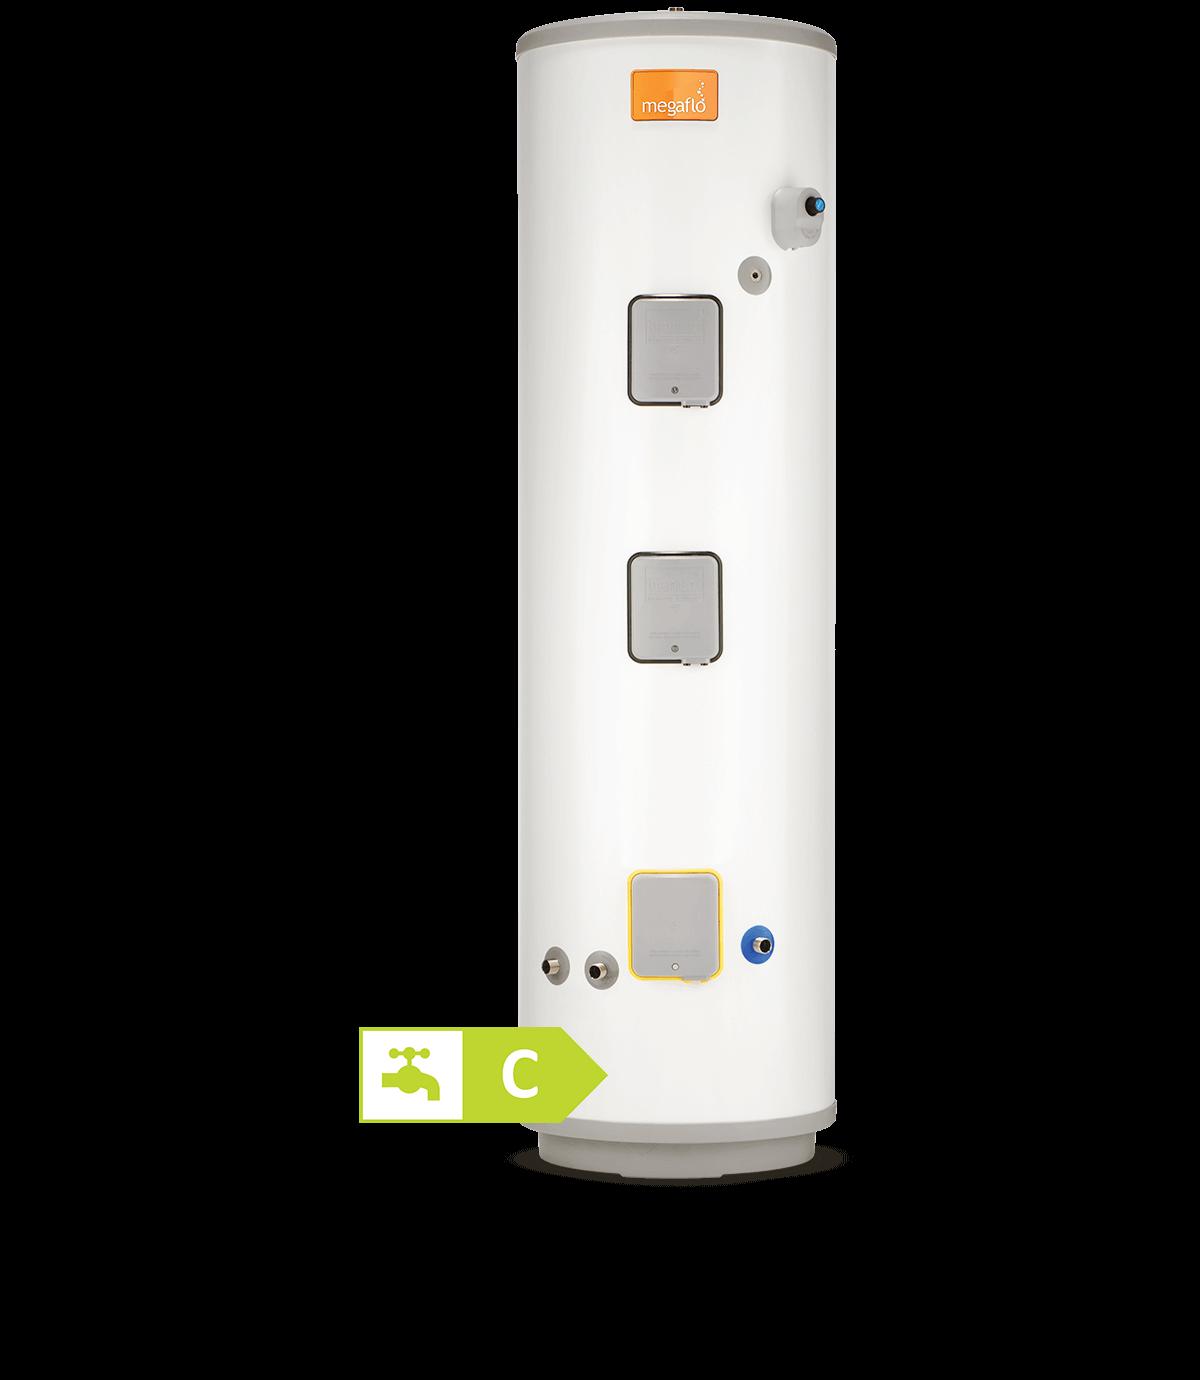 megaflo solar 300